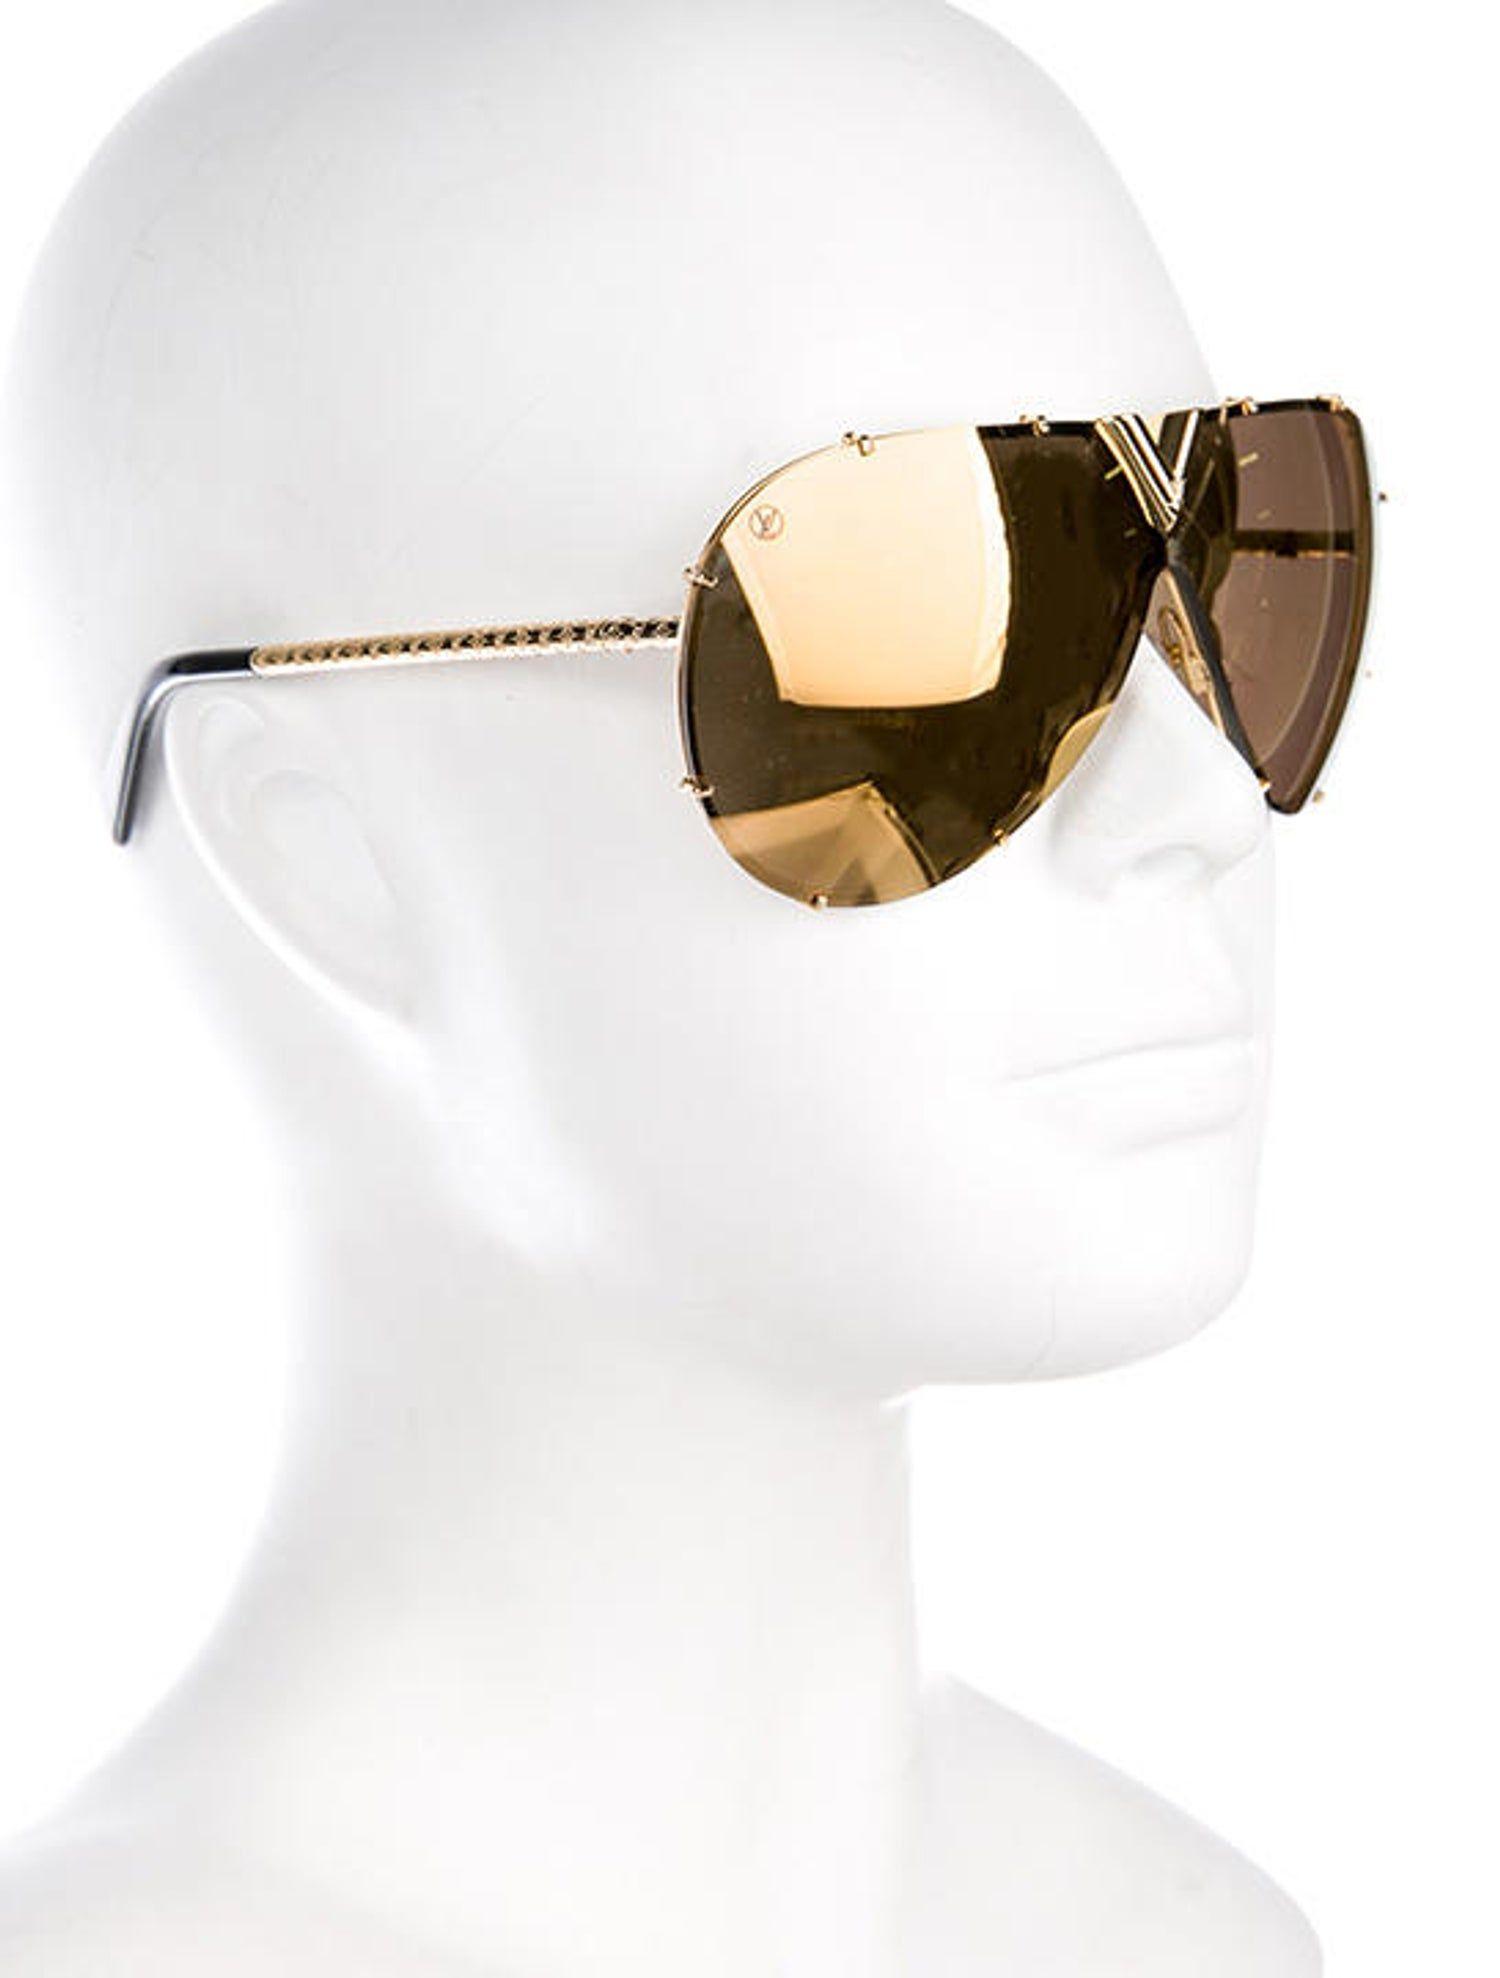 2019 LV Drive Sunglasses